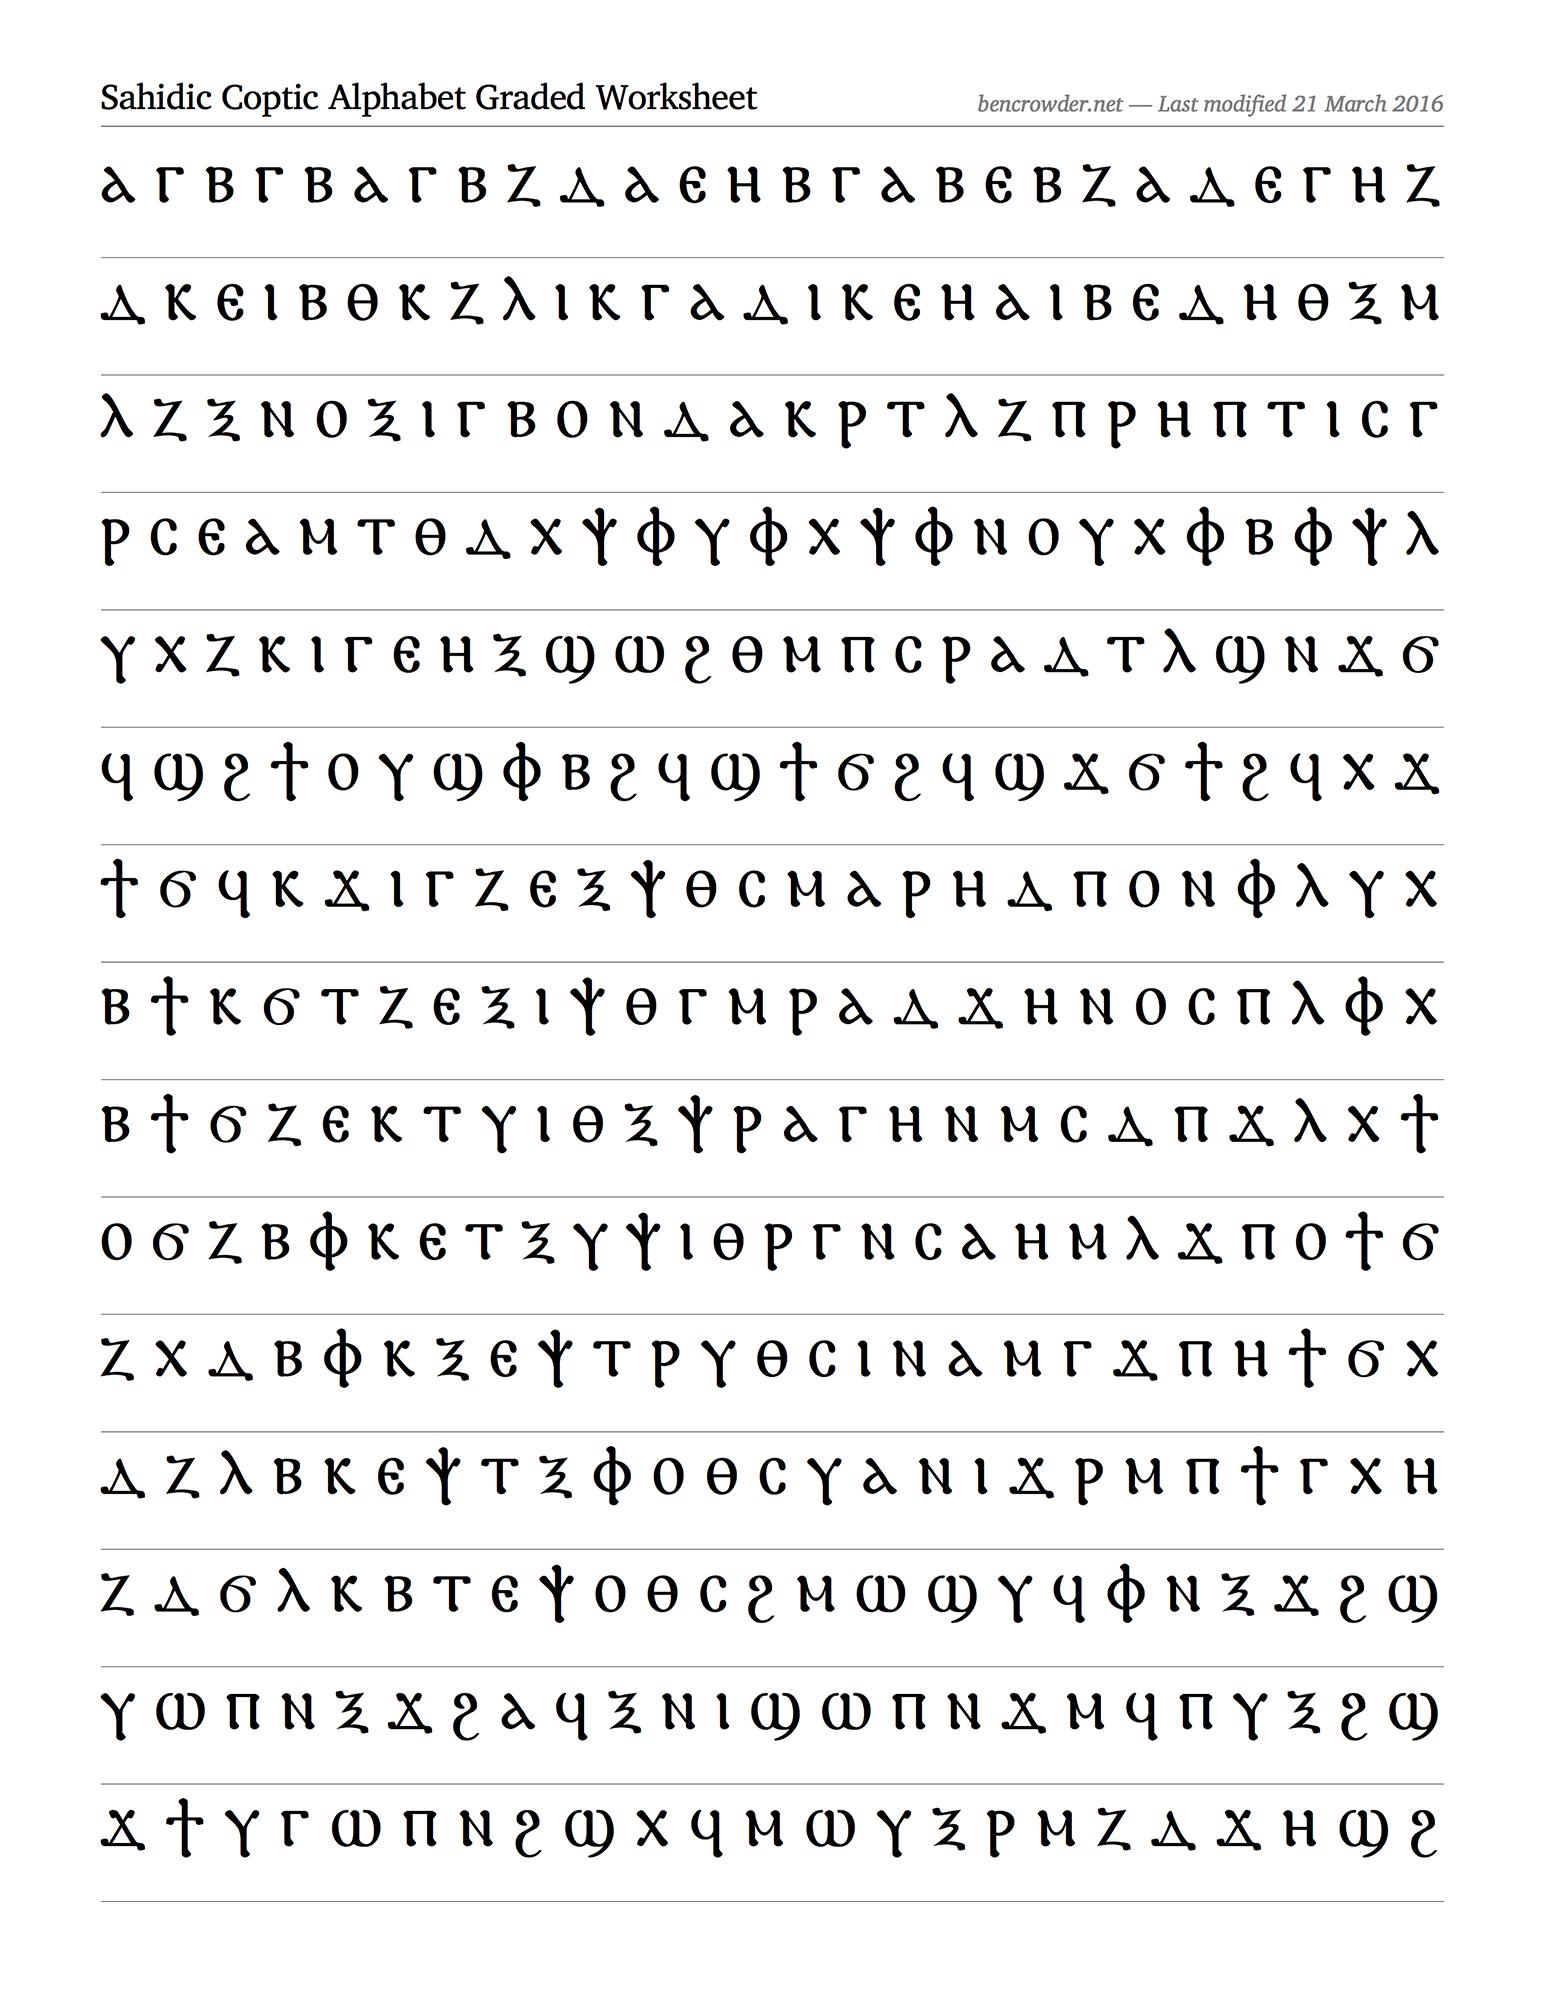 Sahidic Coptic Alphabet Graded Worksheet